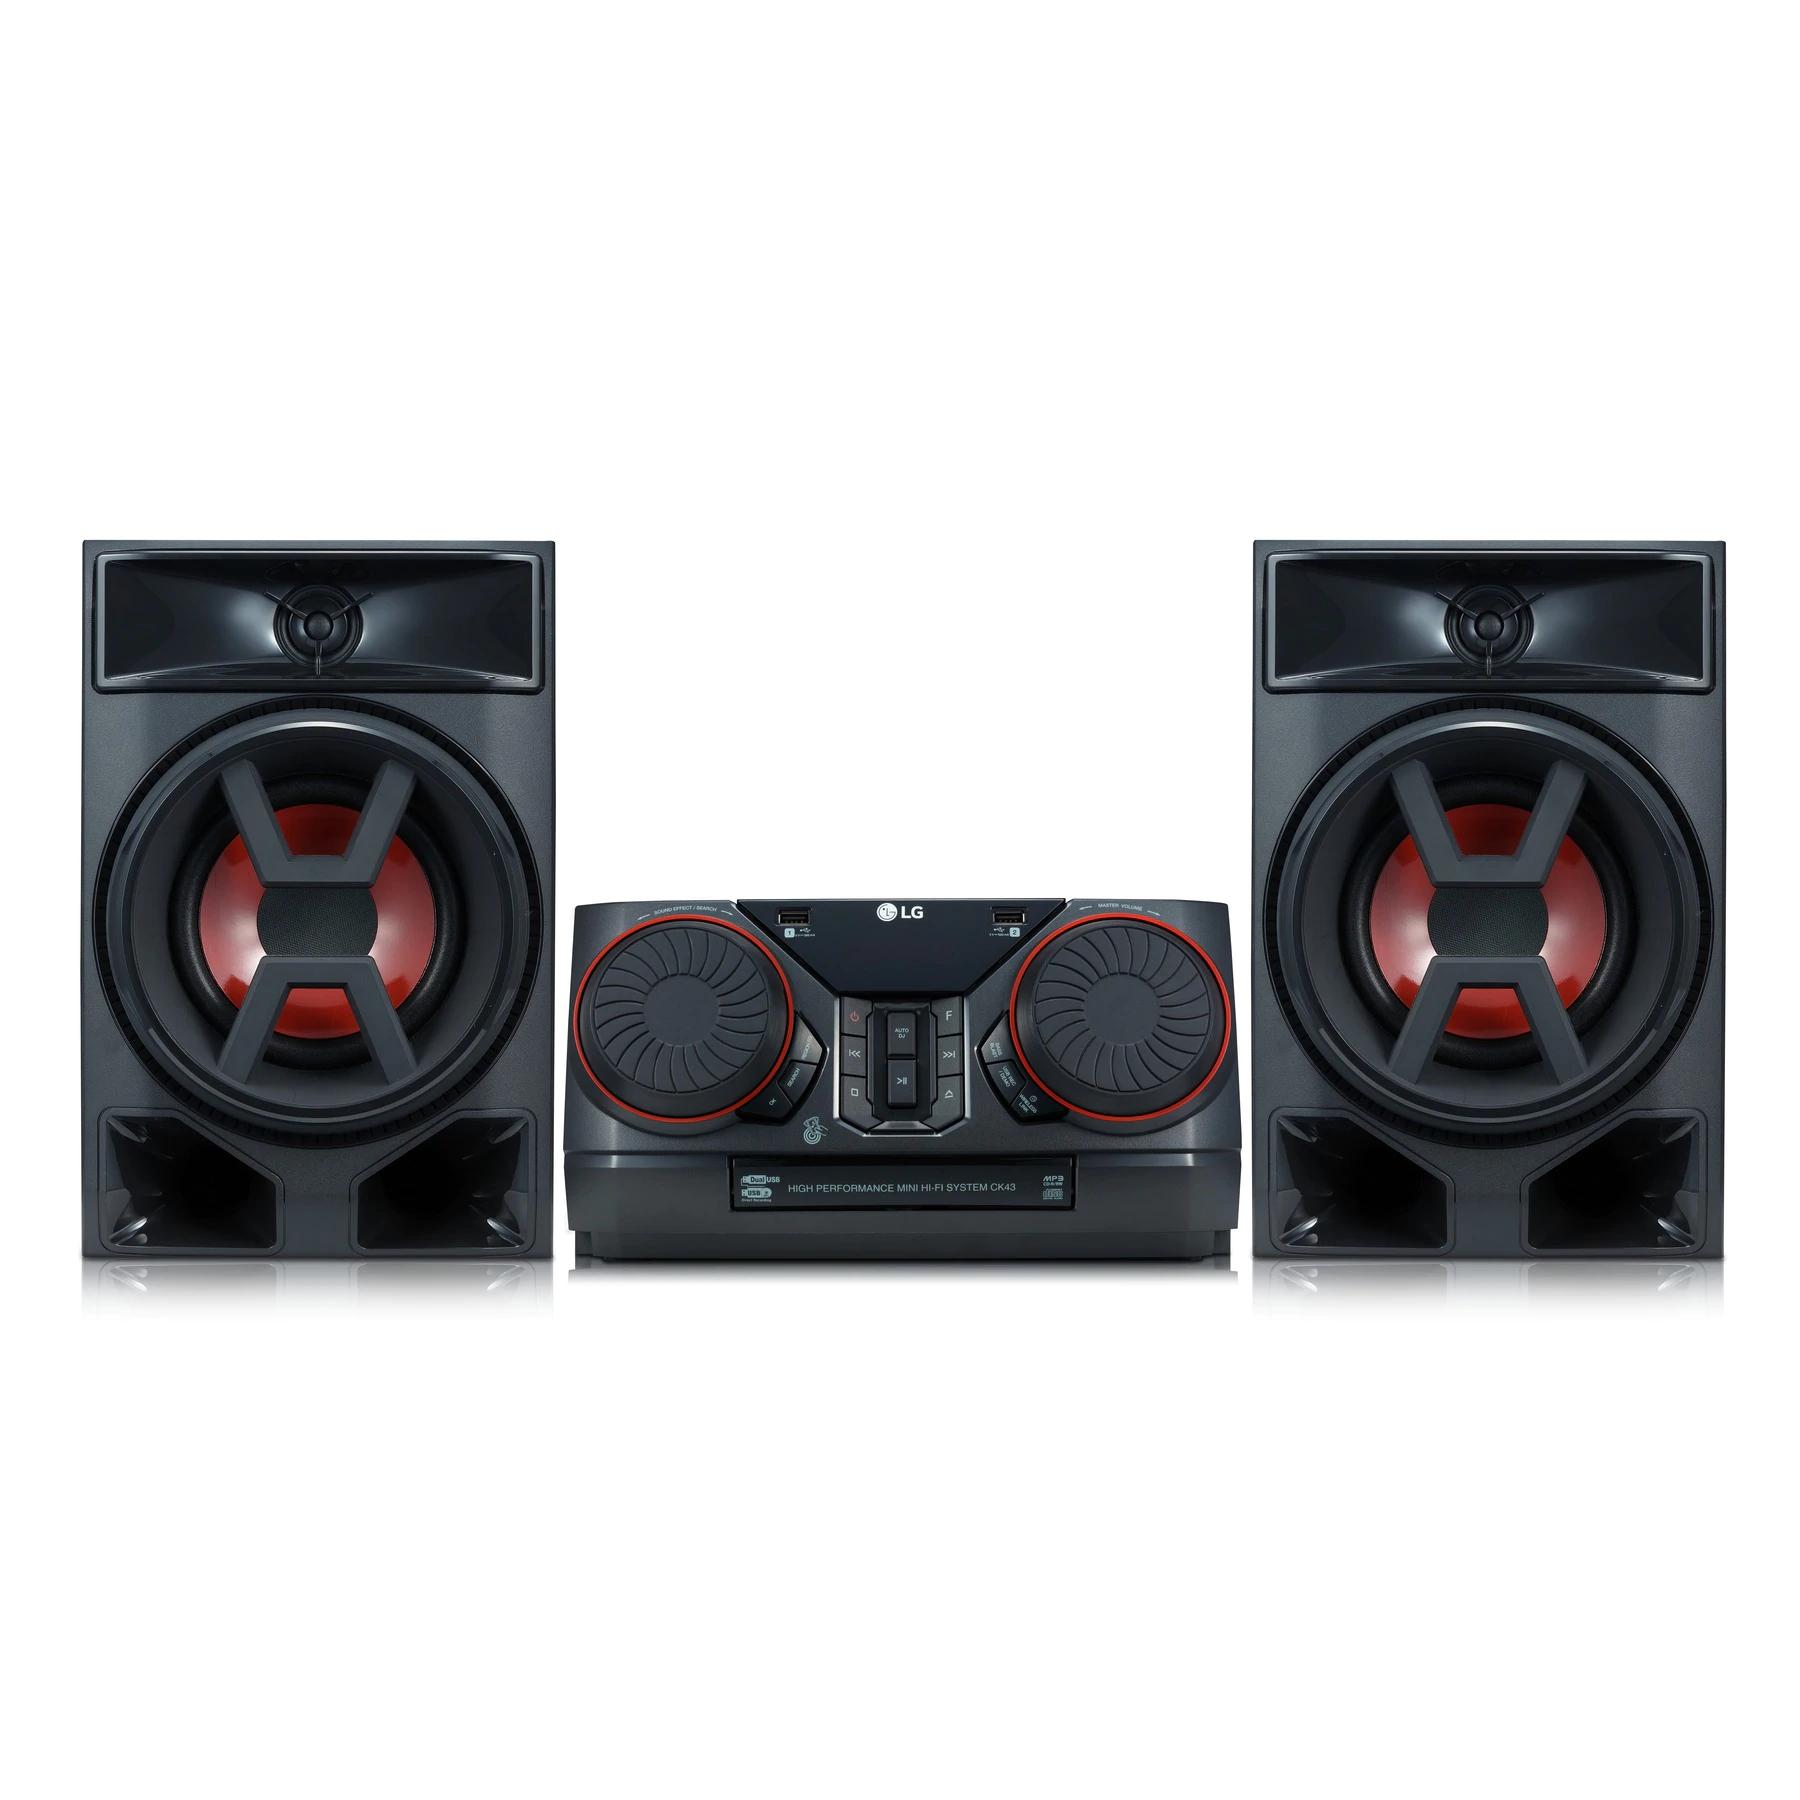 LG XBOOM CK43 - Equipo de Sonido Alta Potencia, 300W (Aliexpress Plaza)